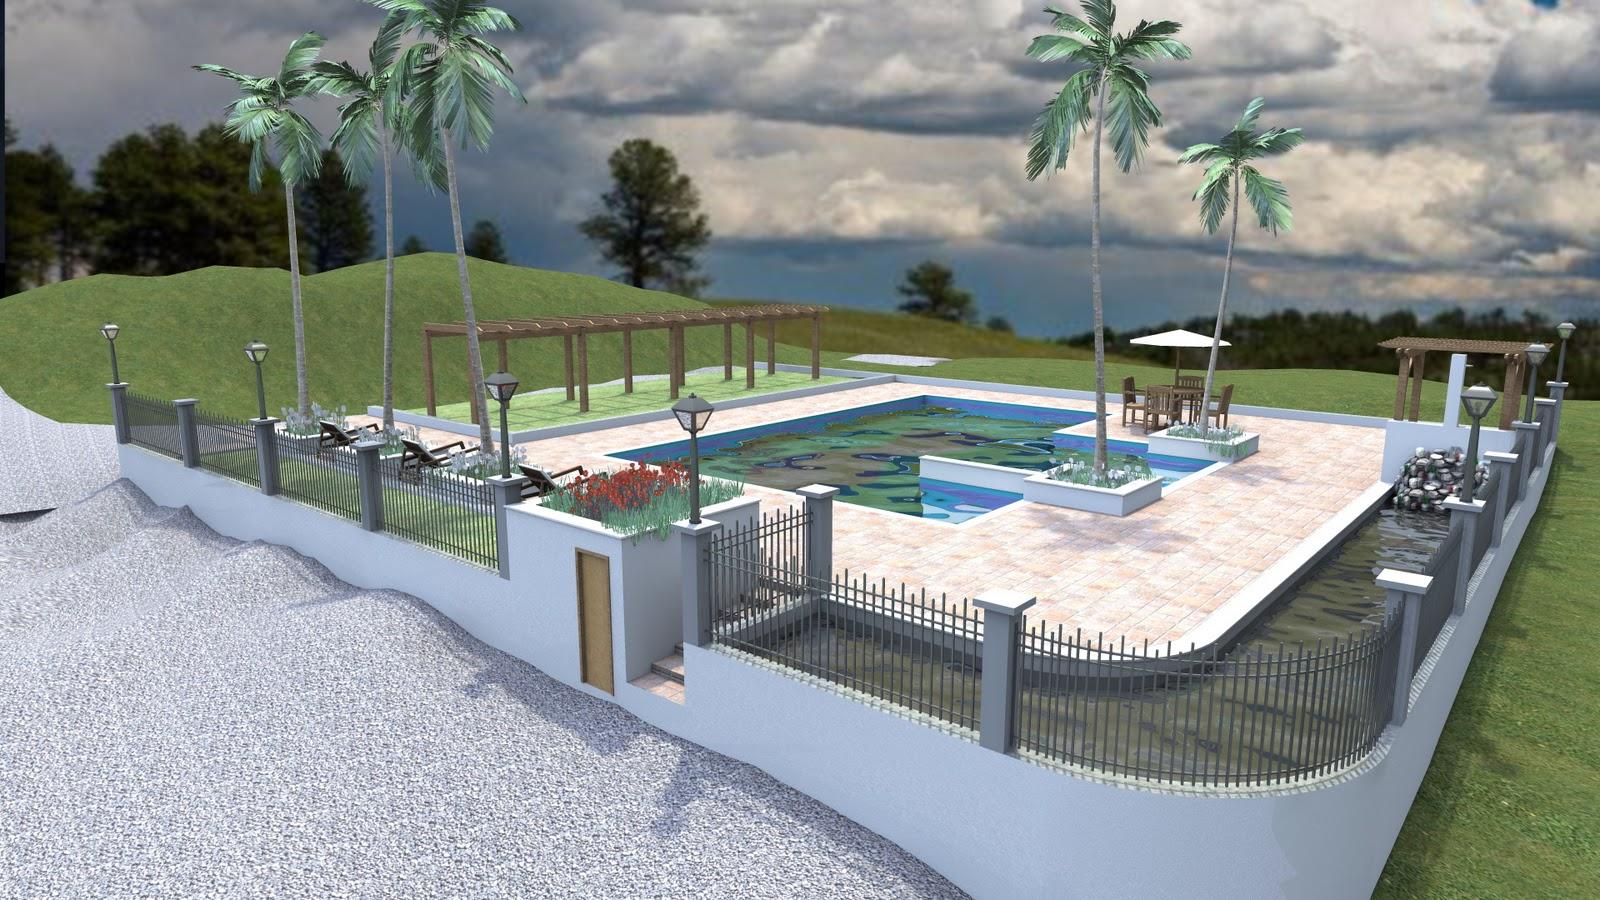 Nova piscina 3d hees for Piscina 3d